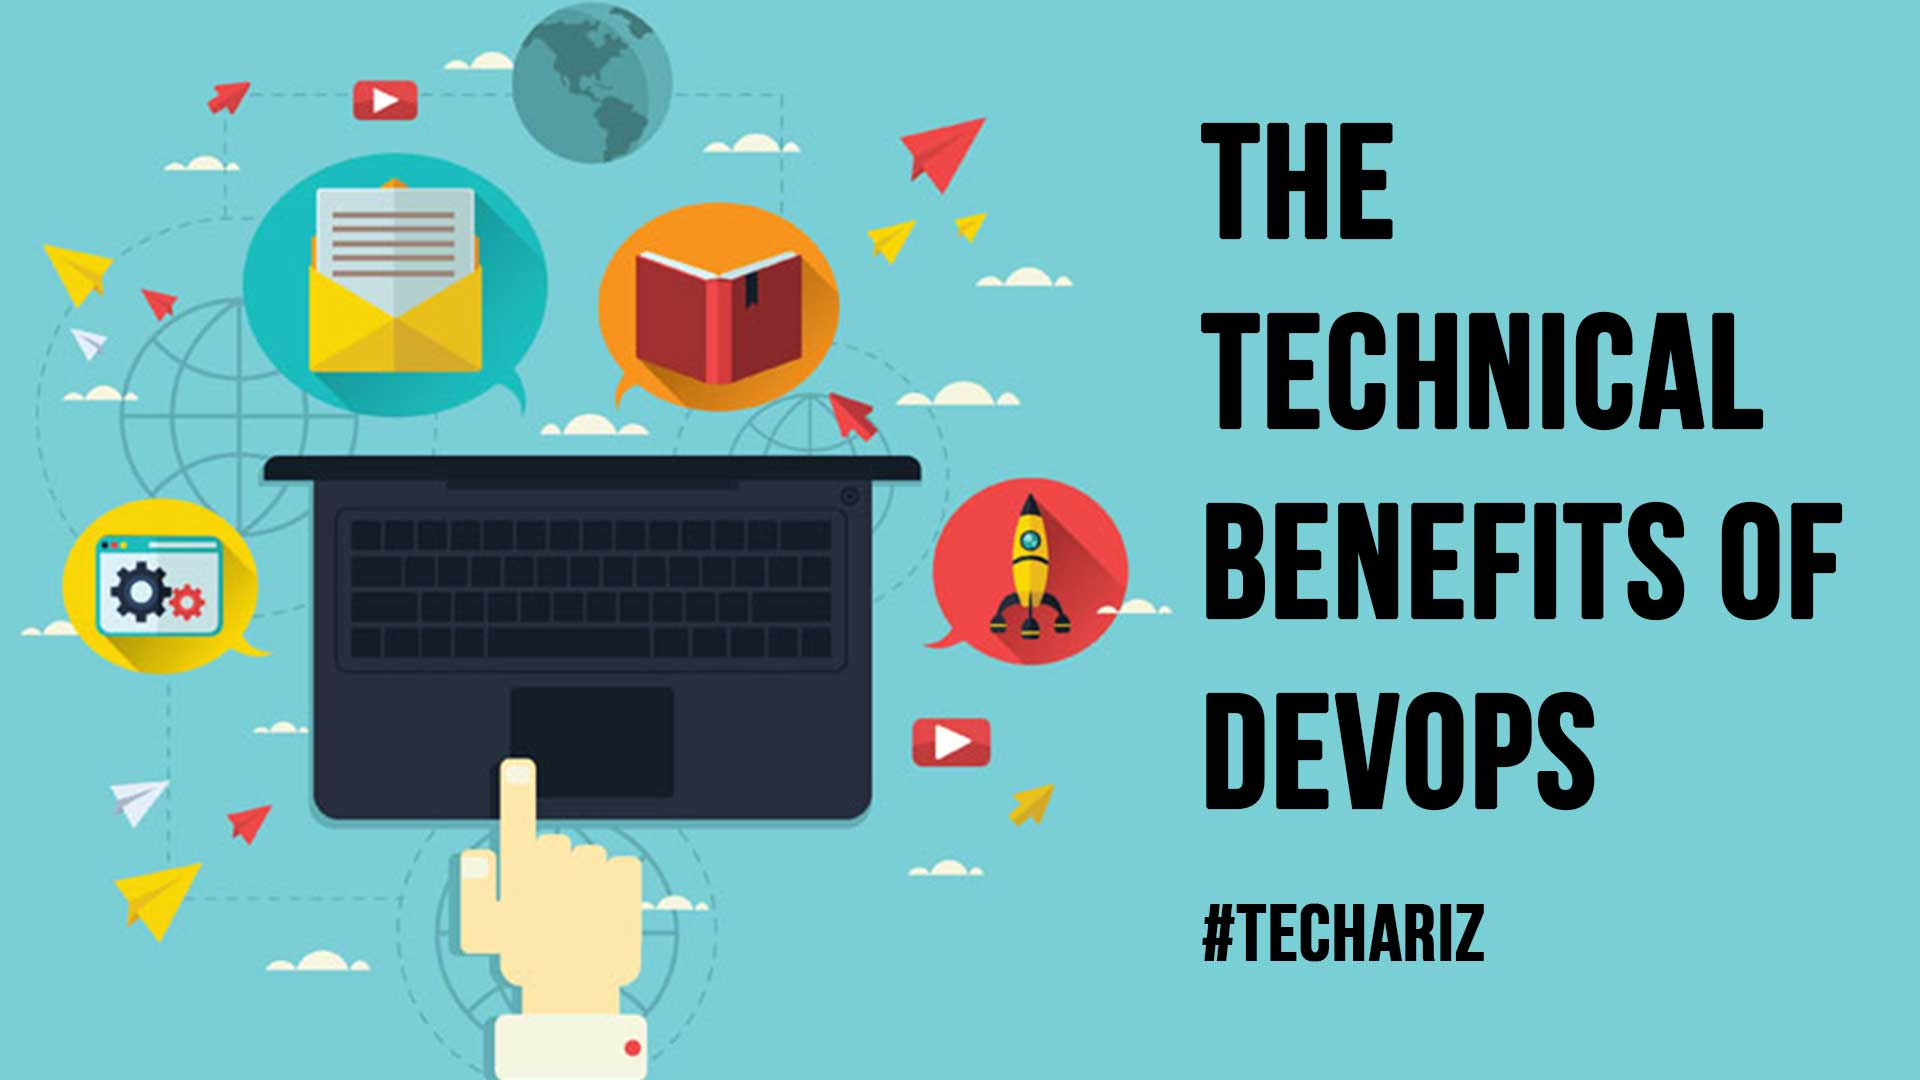 The Technical Benefits of DevOps